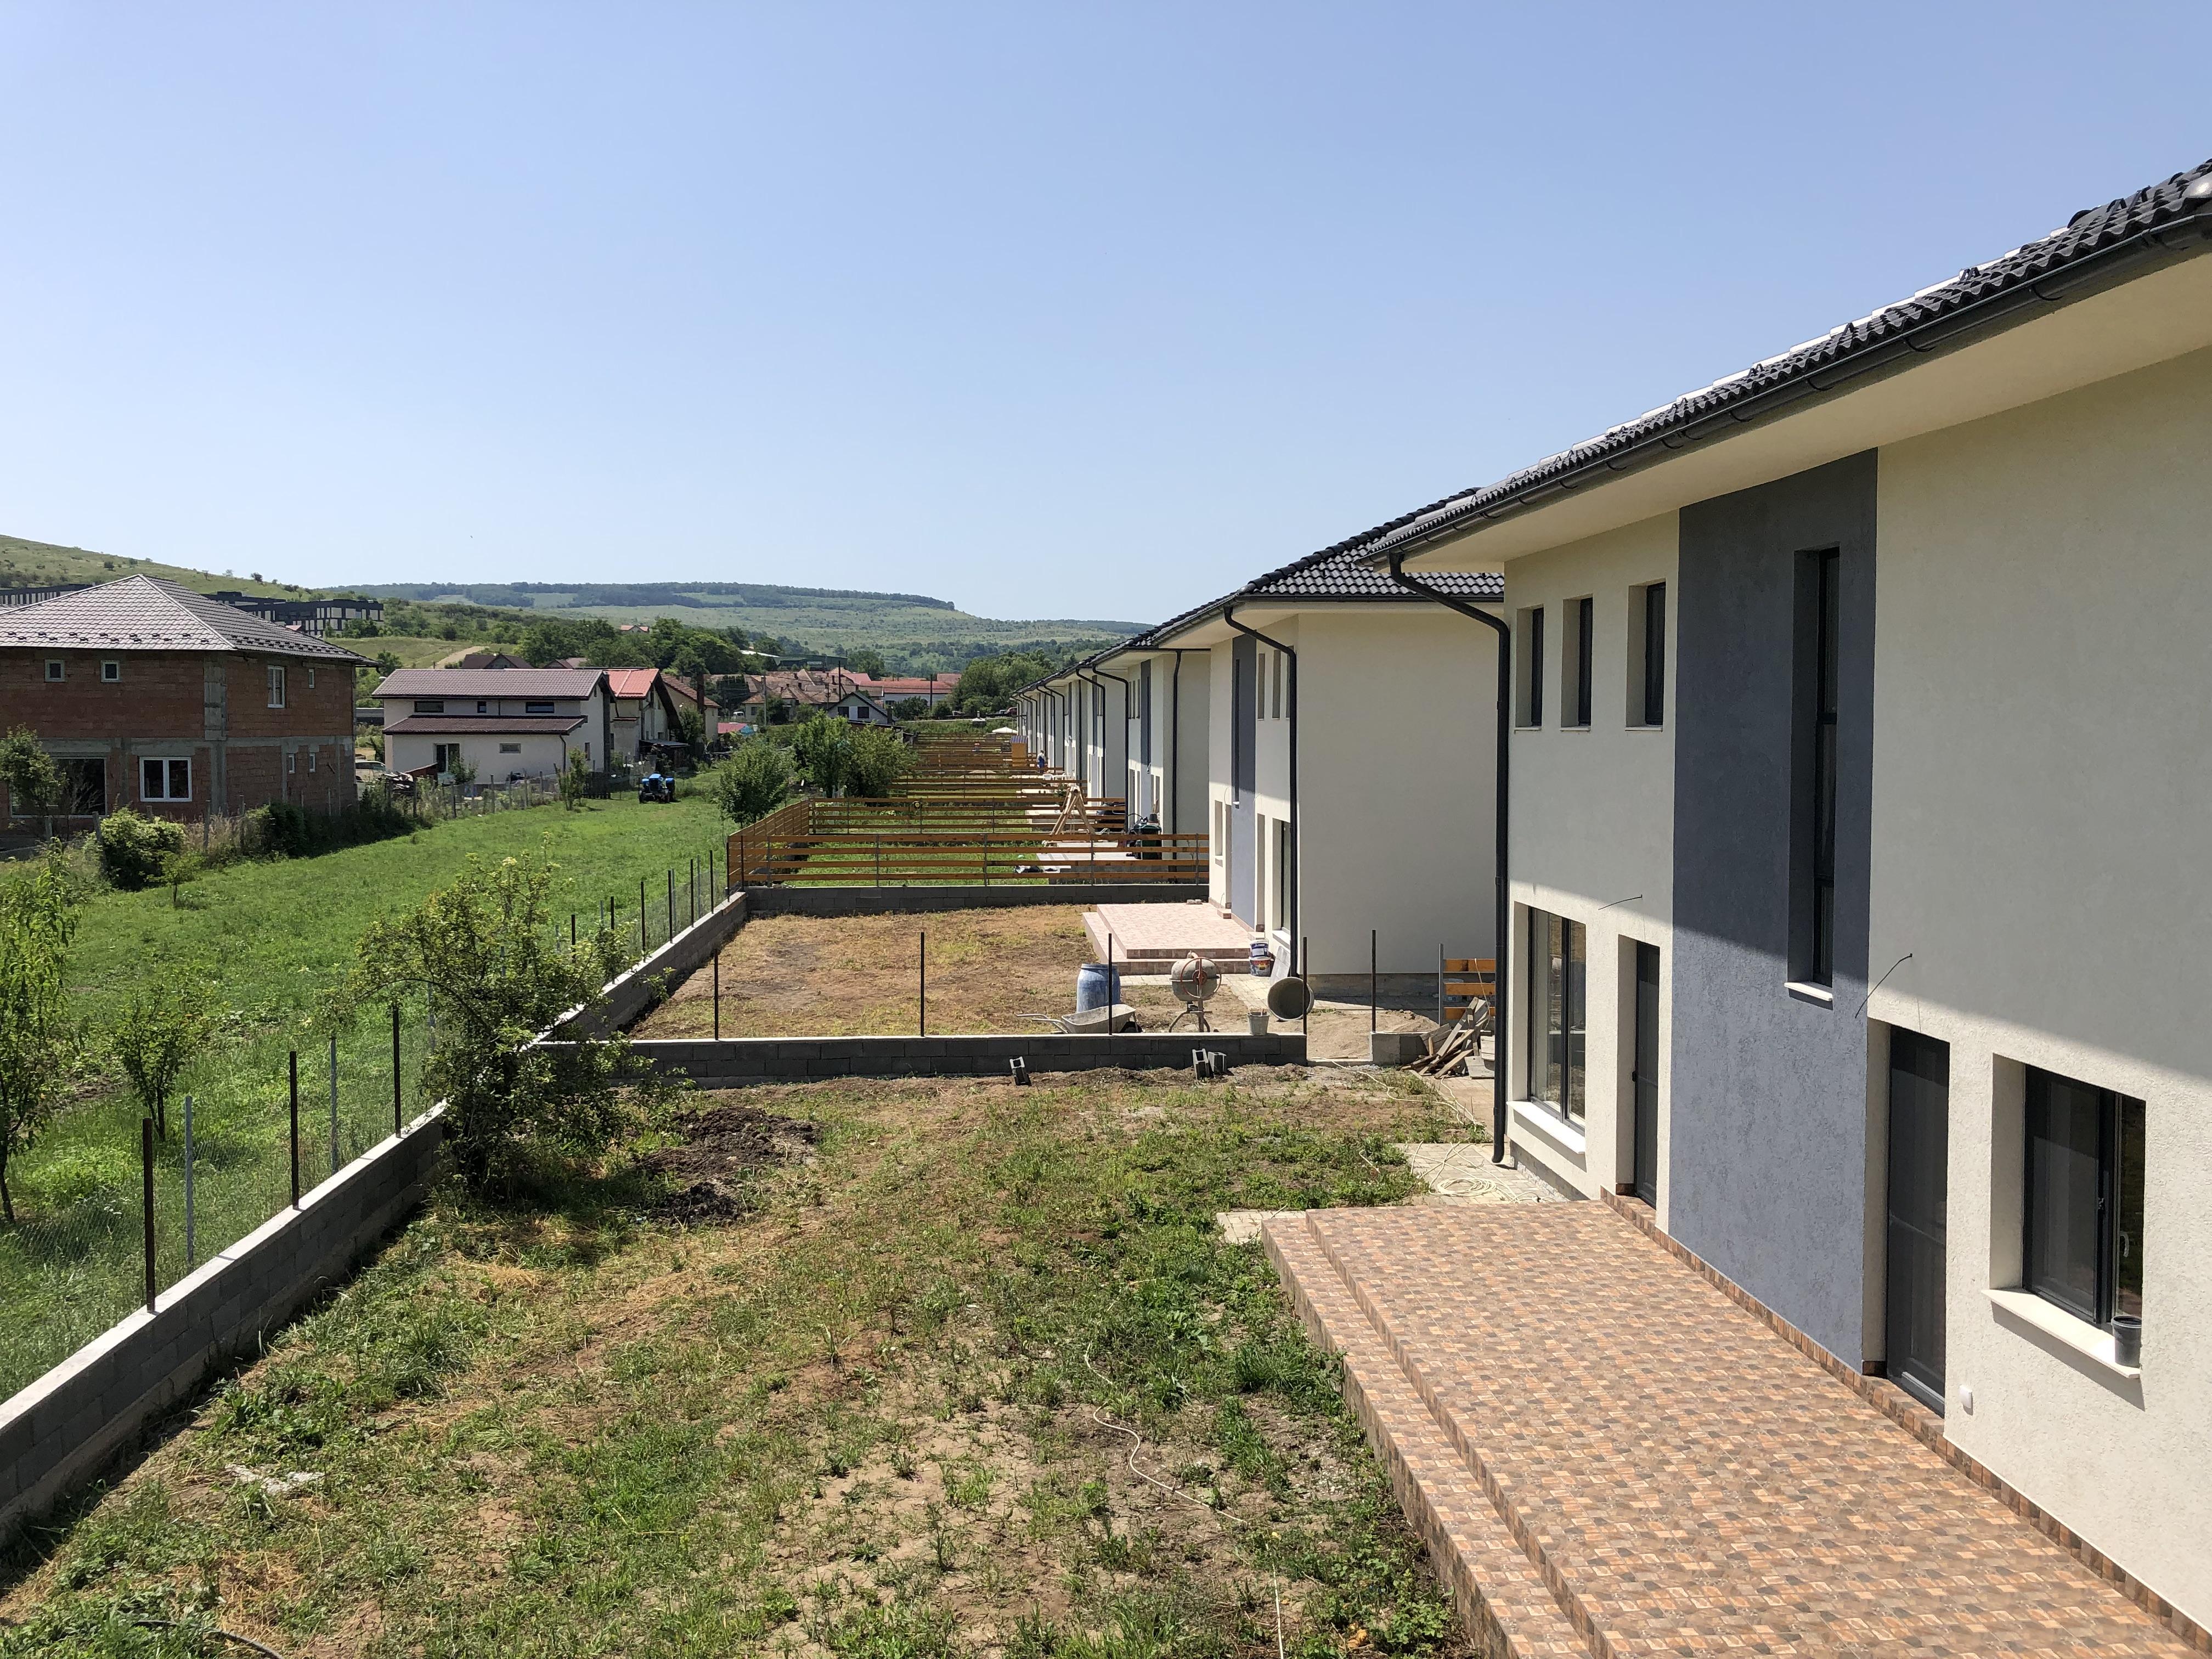 178875-Vanzare casa, Zona Baciu, Cluj-Napoca